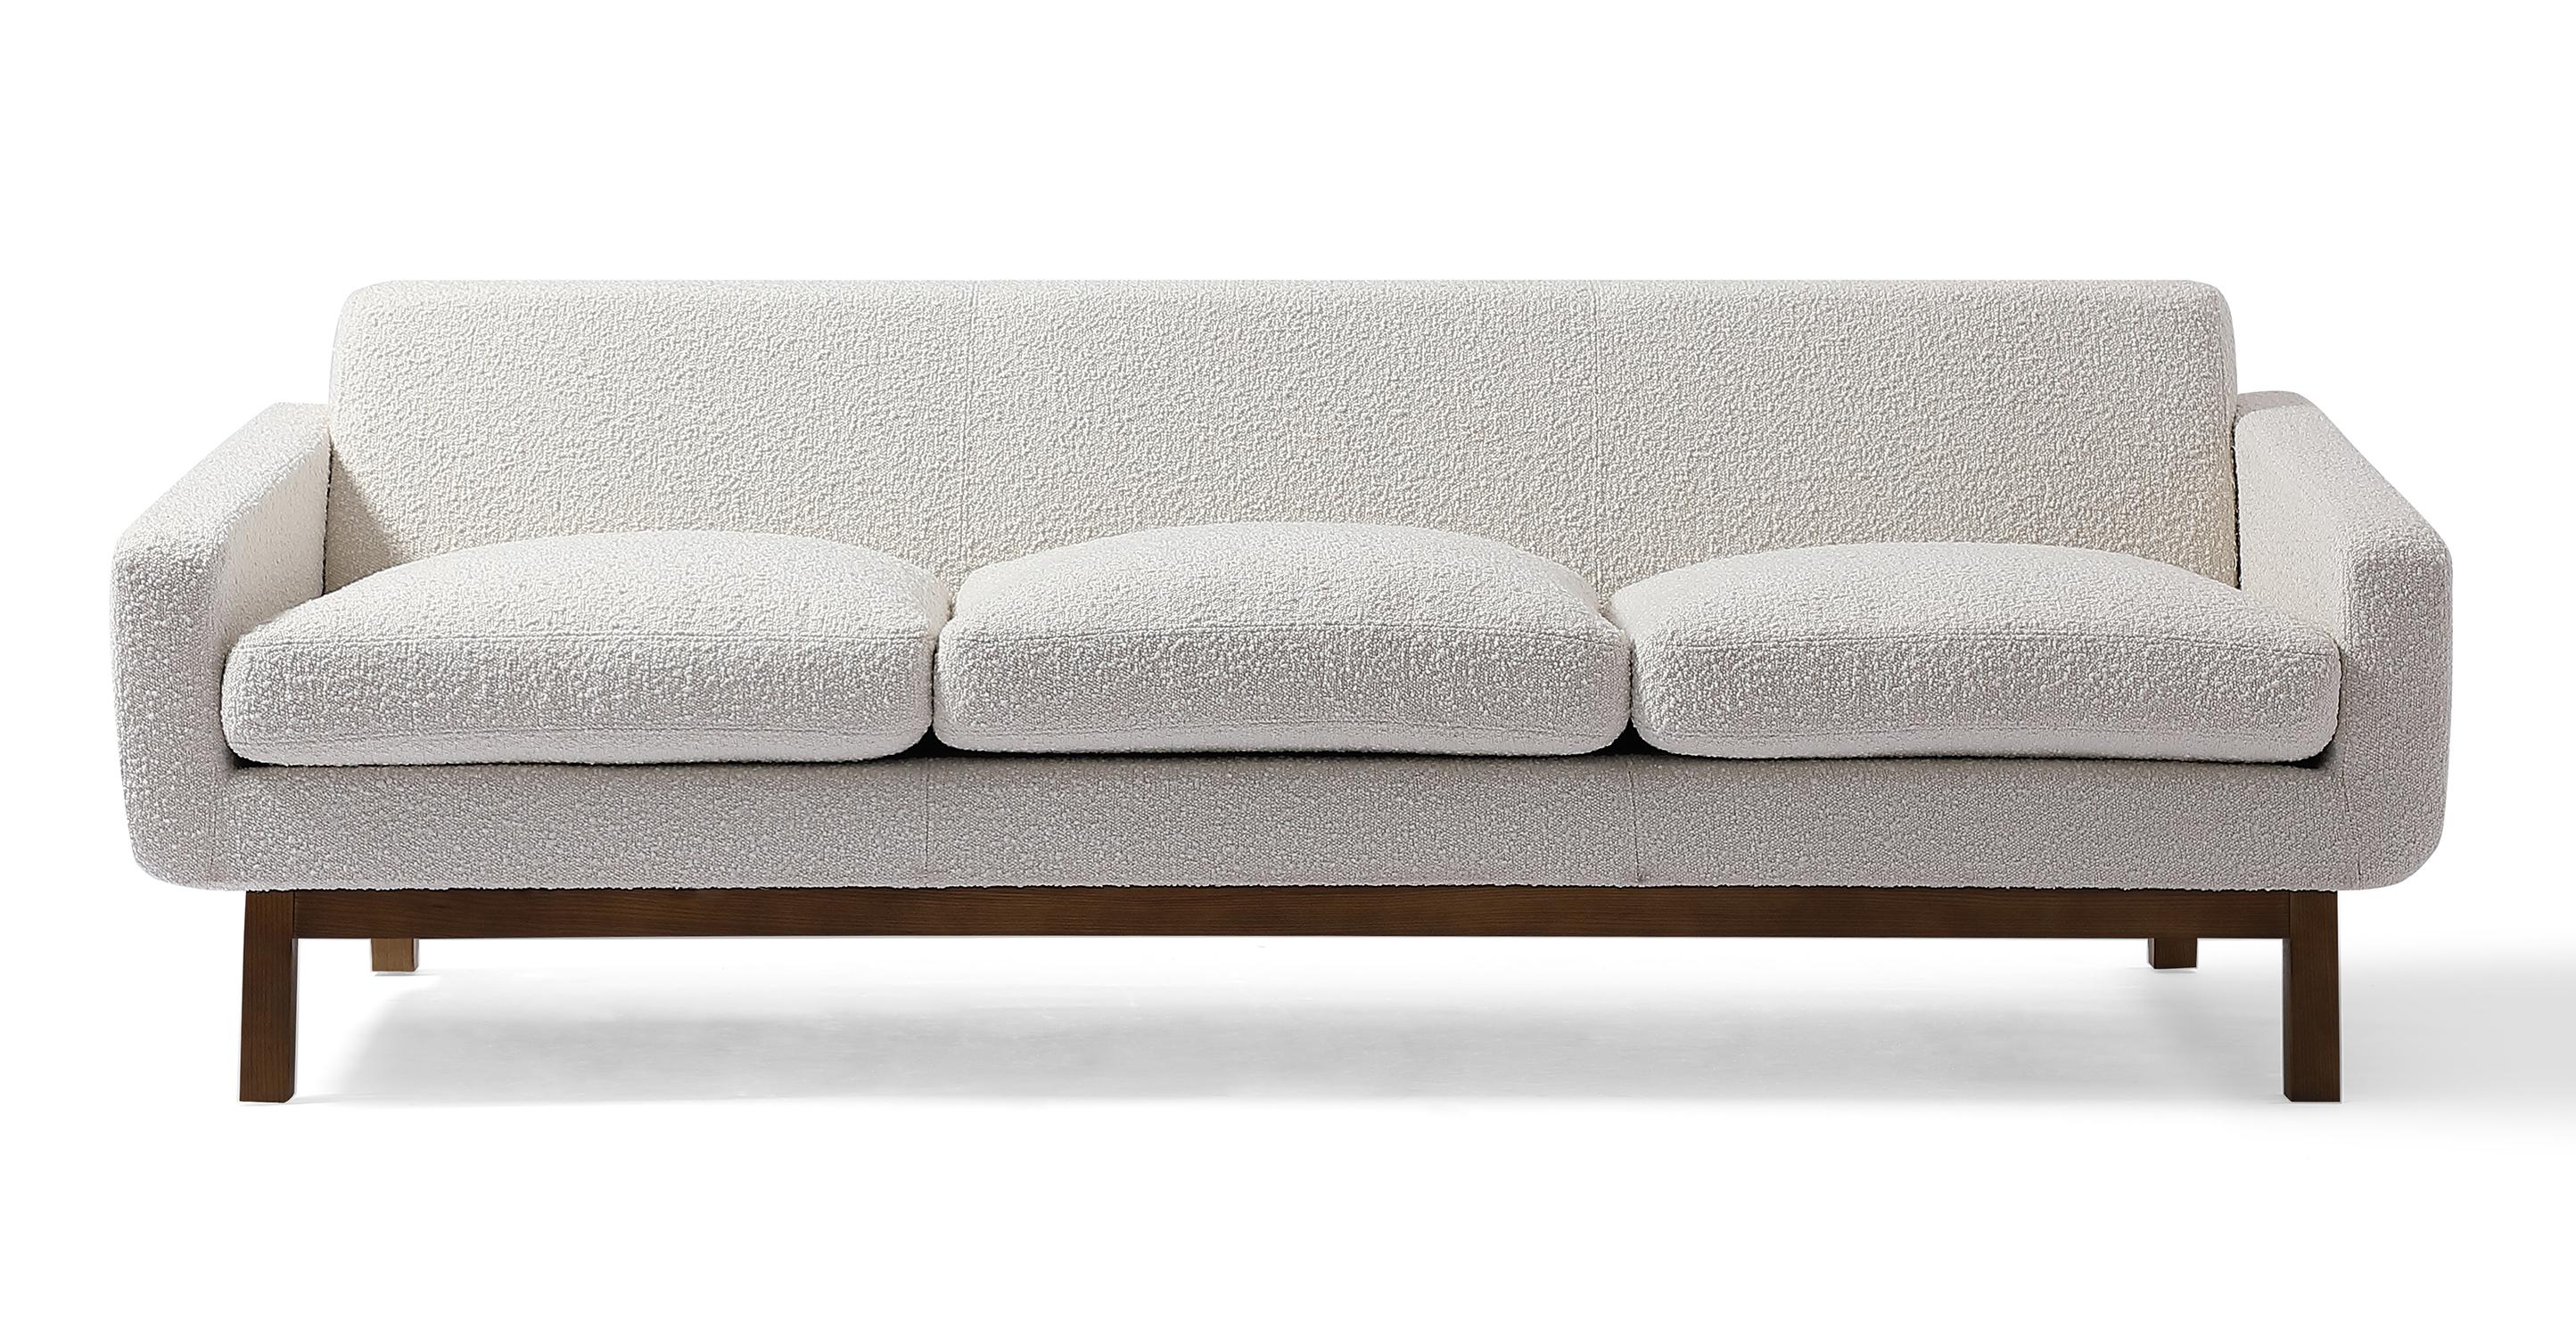 "Platform 80"" Fabric Sofa, Walnut/Blanc Boucle"